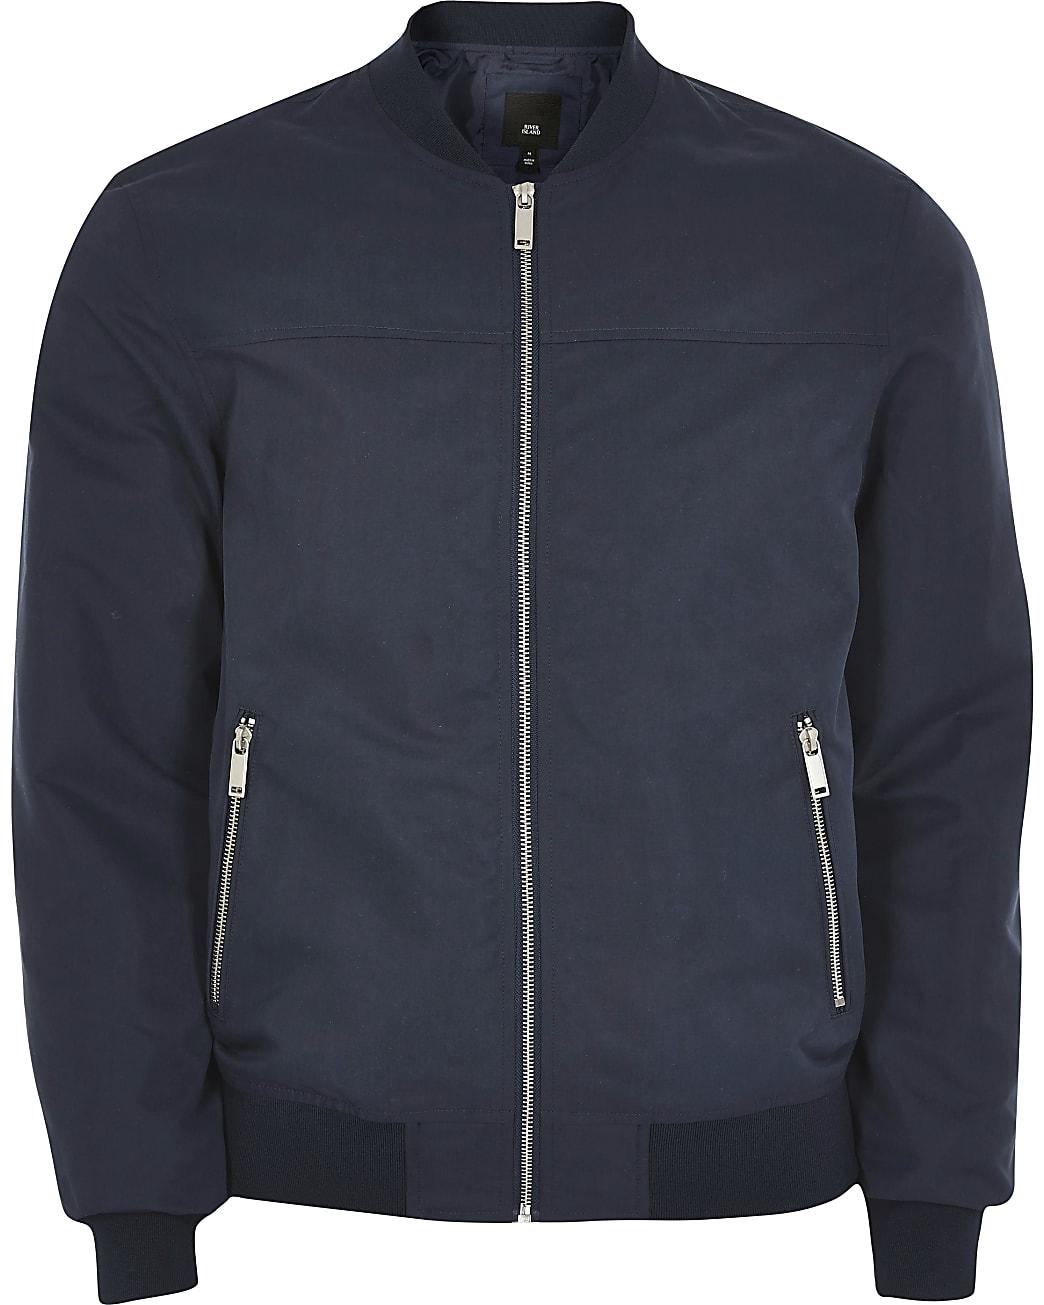 Big & Tall navy zip front bomber jacket